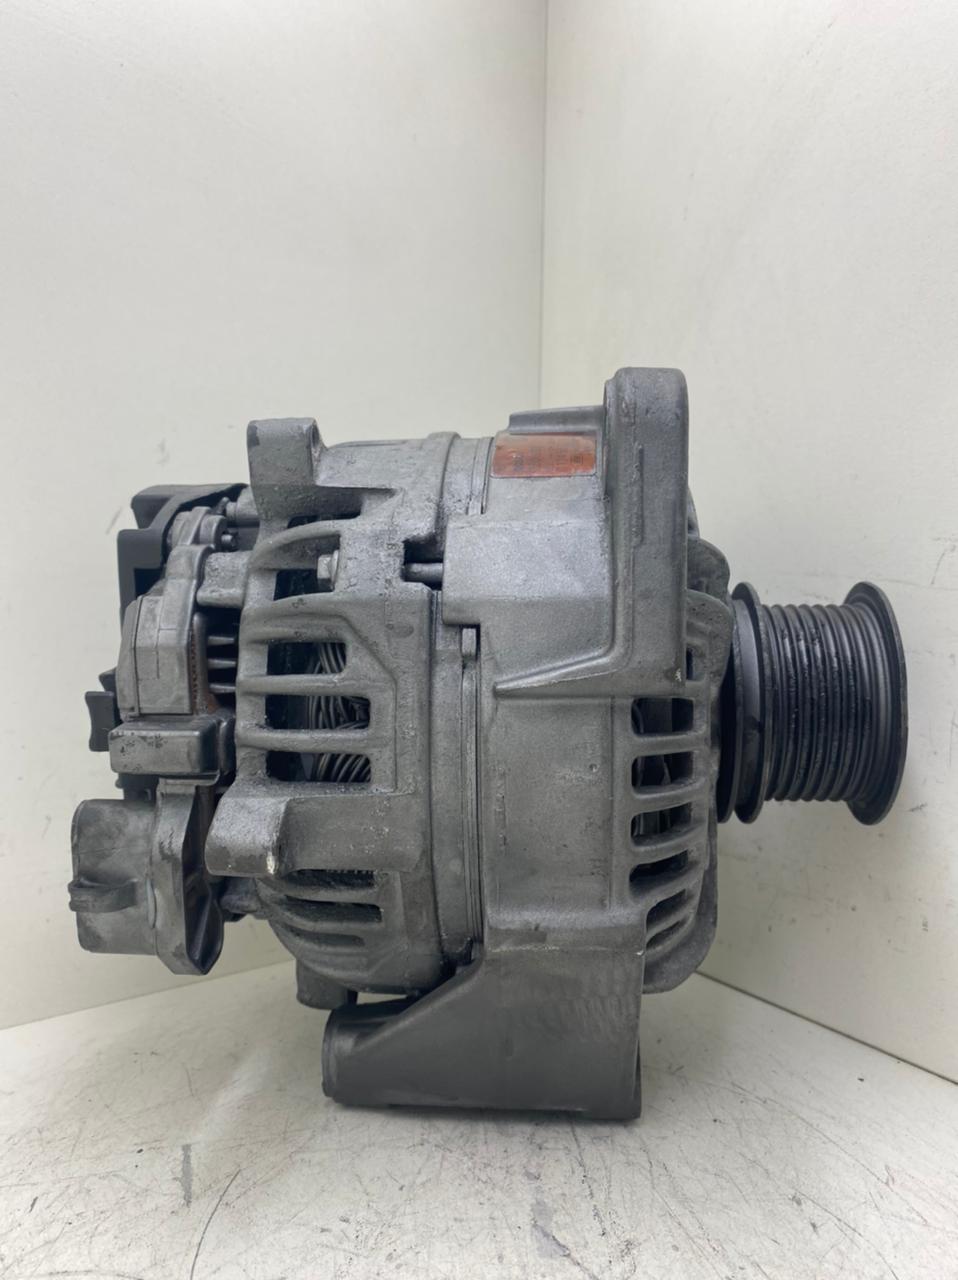 Alternador VW 13180 15180 Cummins 7110 7120 8120 8150 MWM Eletronico 12V 90AmP 0124325107 0124325067 2S0903015